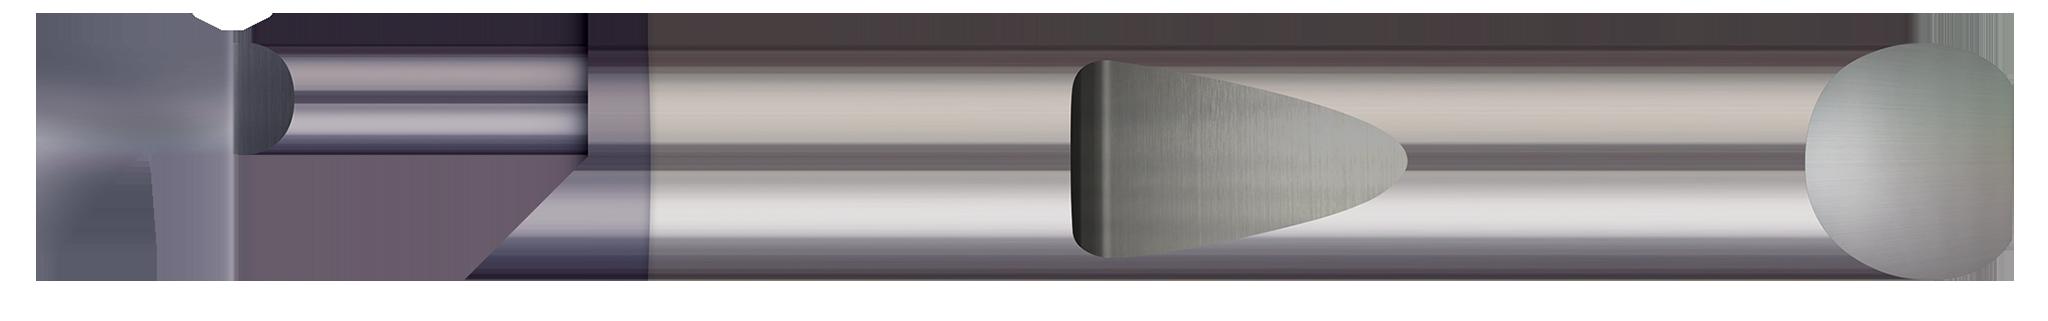 Quick Change – Profiling Tools – Radial Profiling